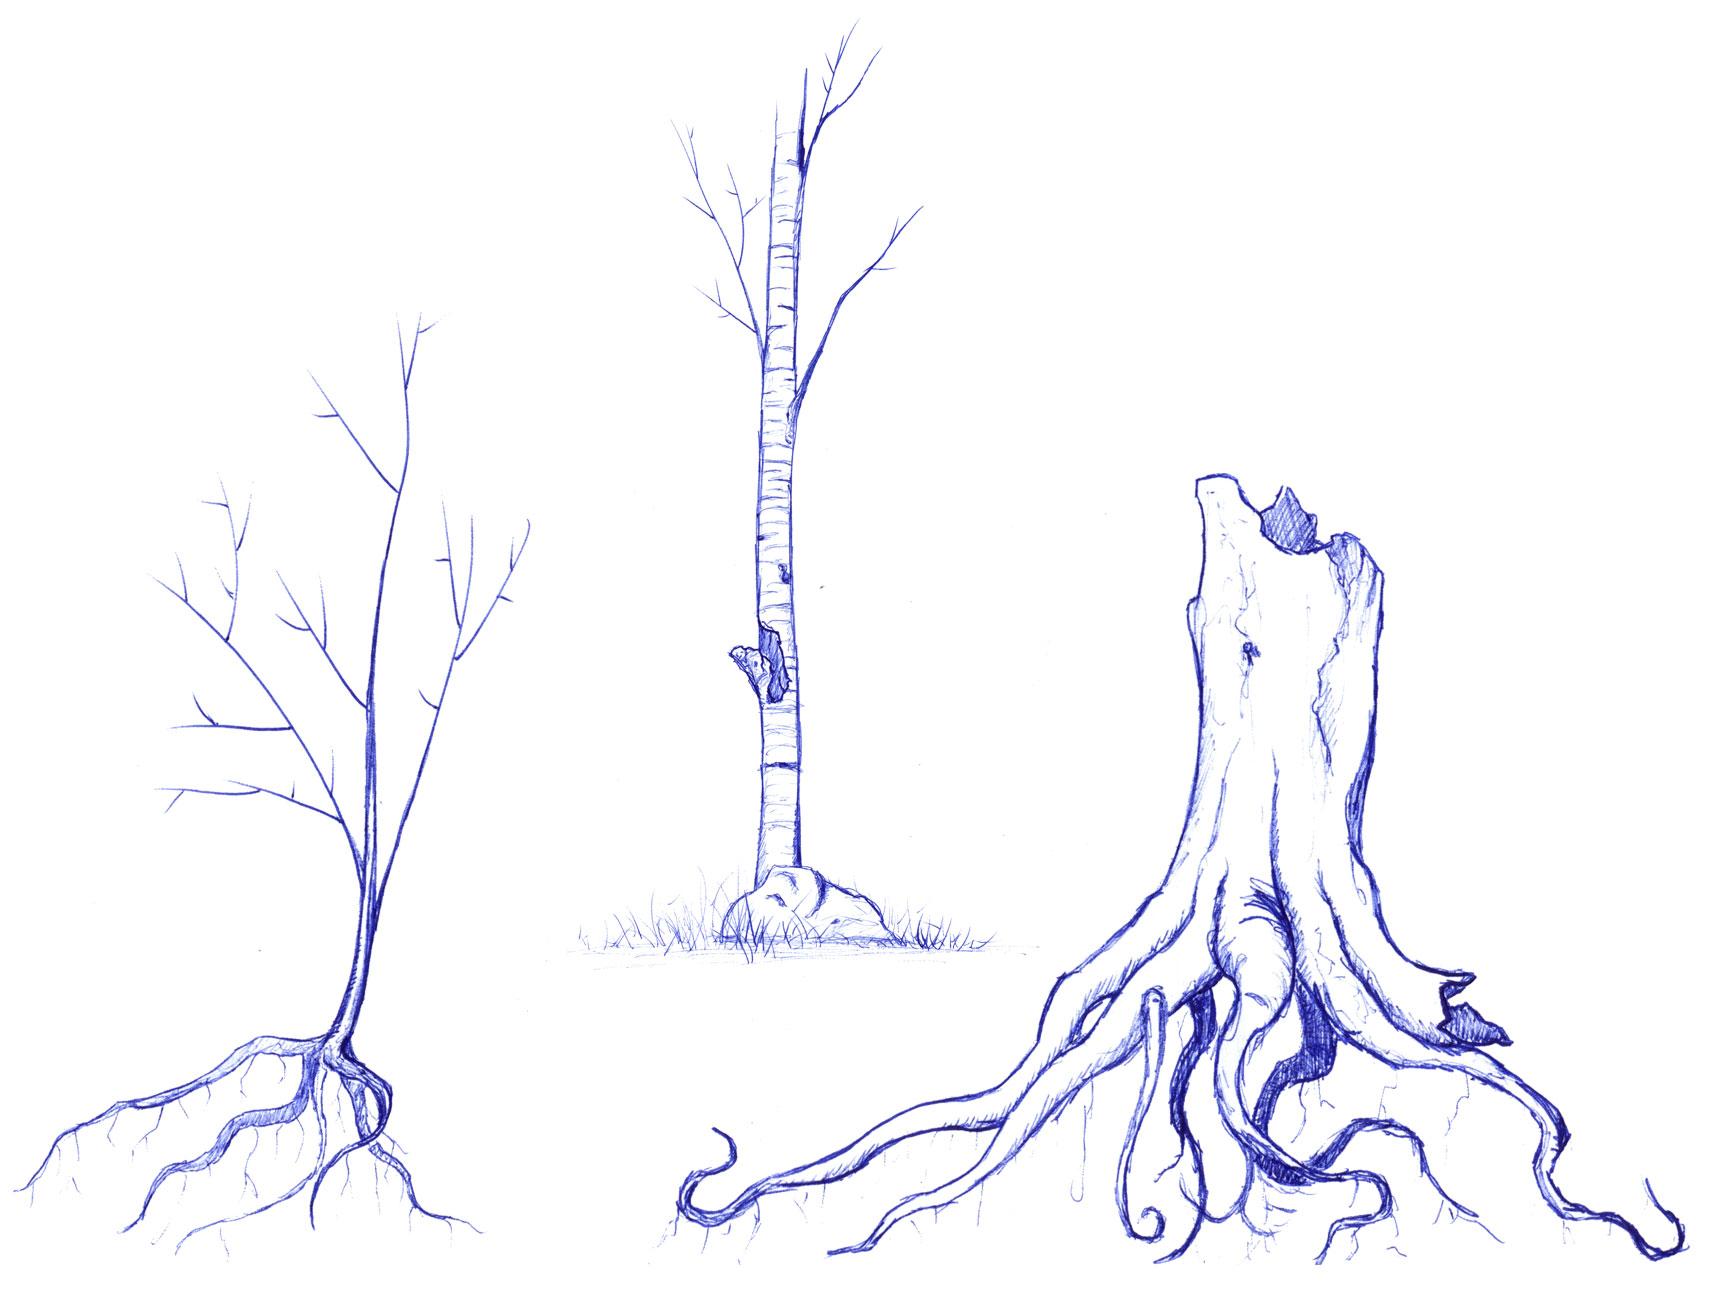 Tree Study & Exploration